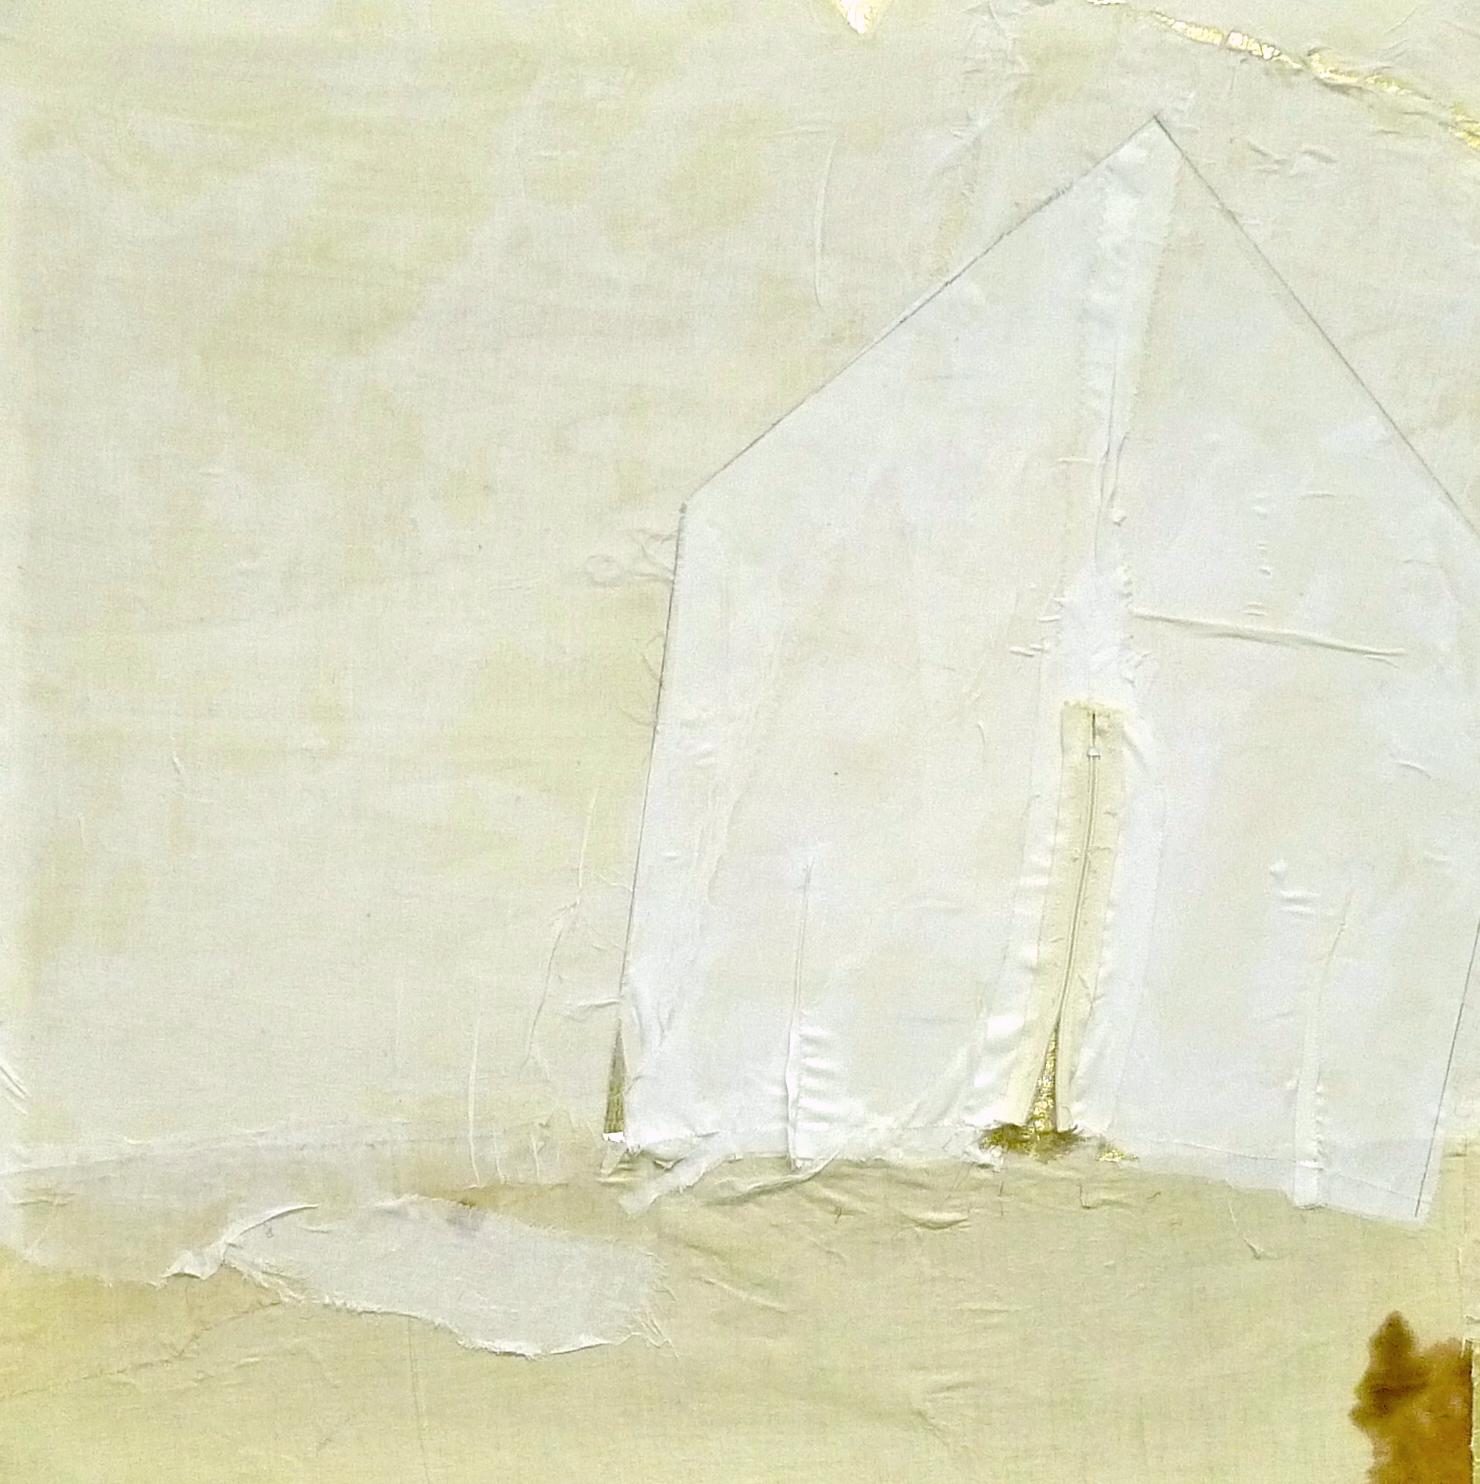 """Kintsugi"" by Brenda Cirioni"